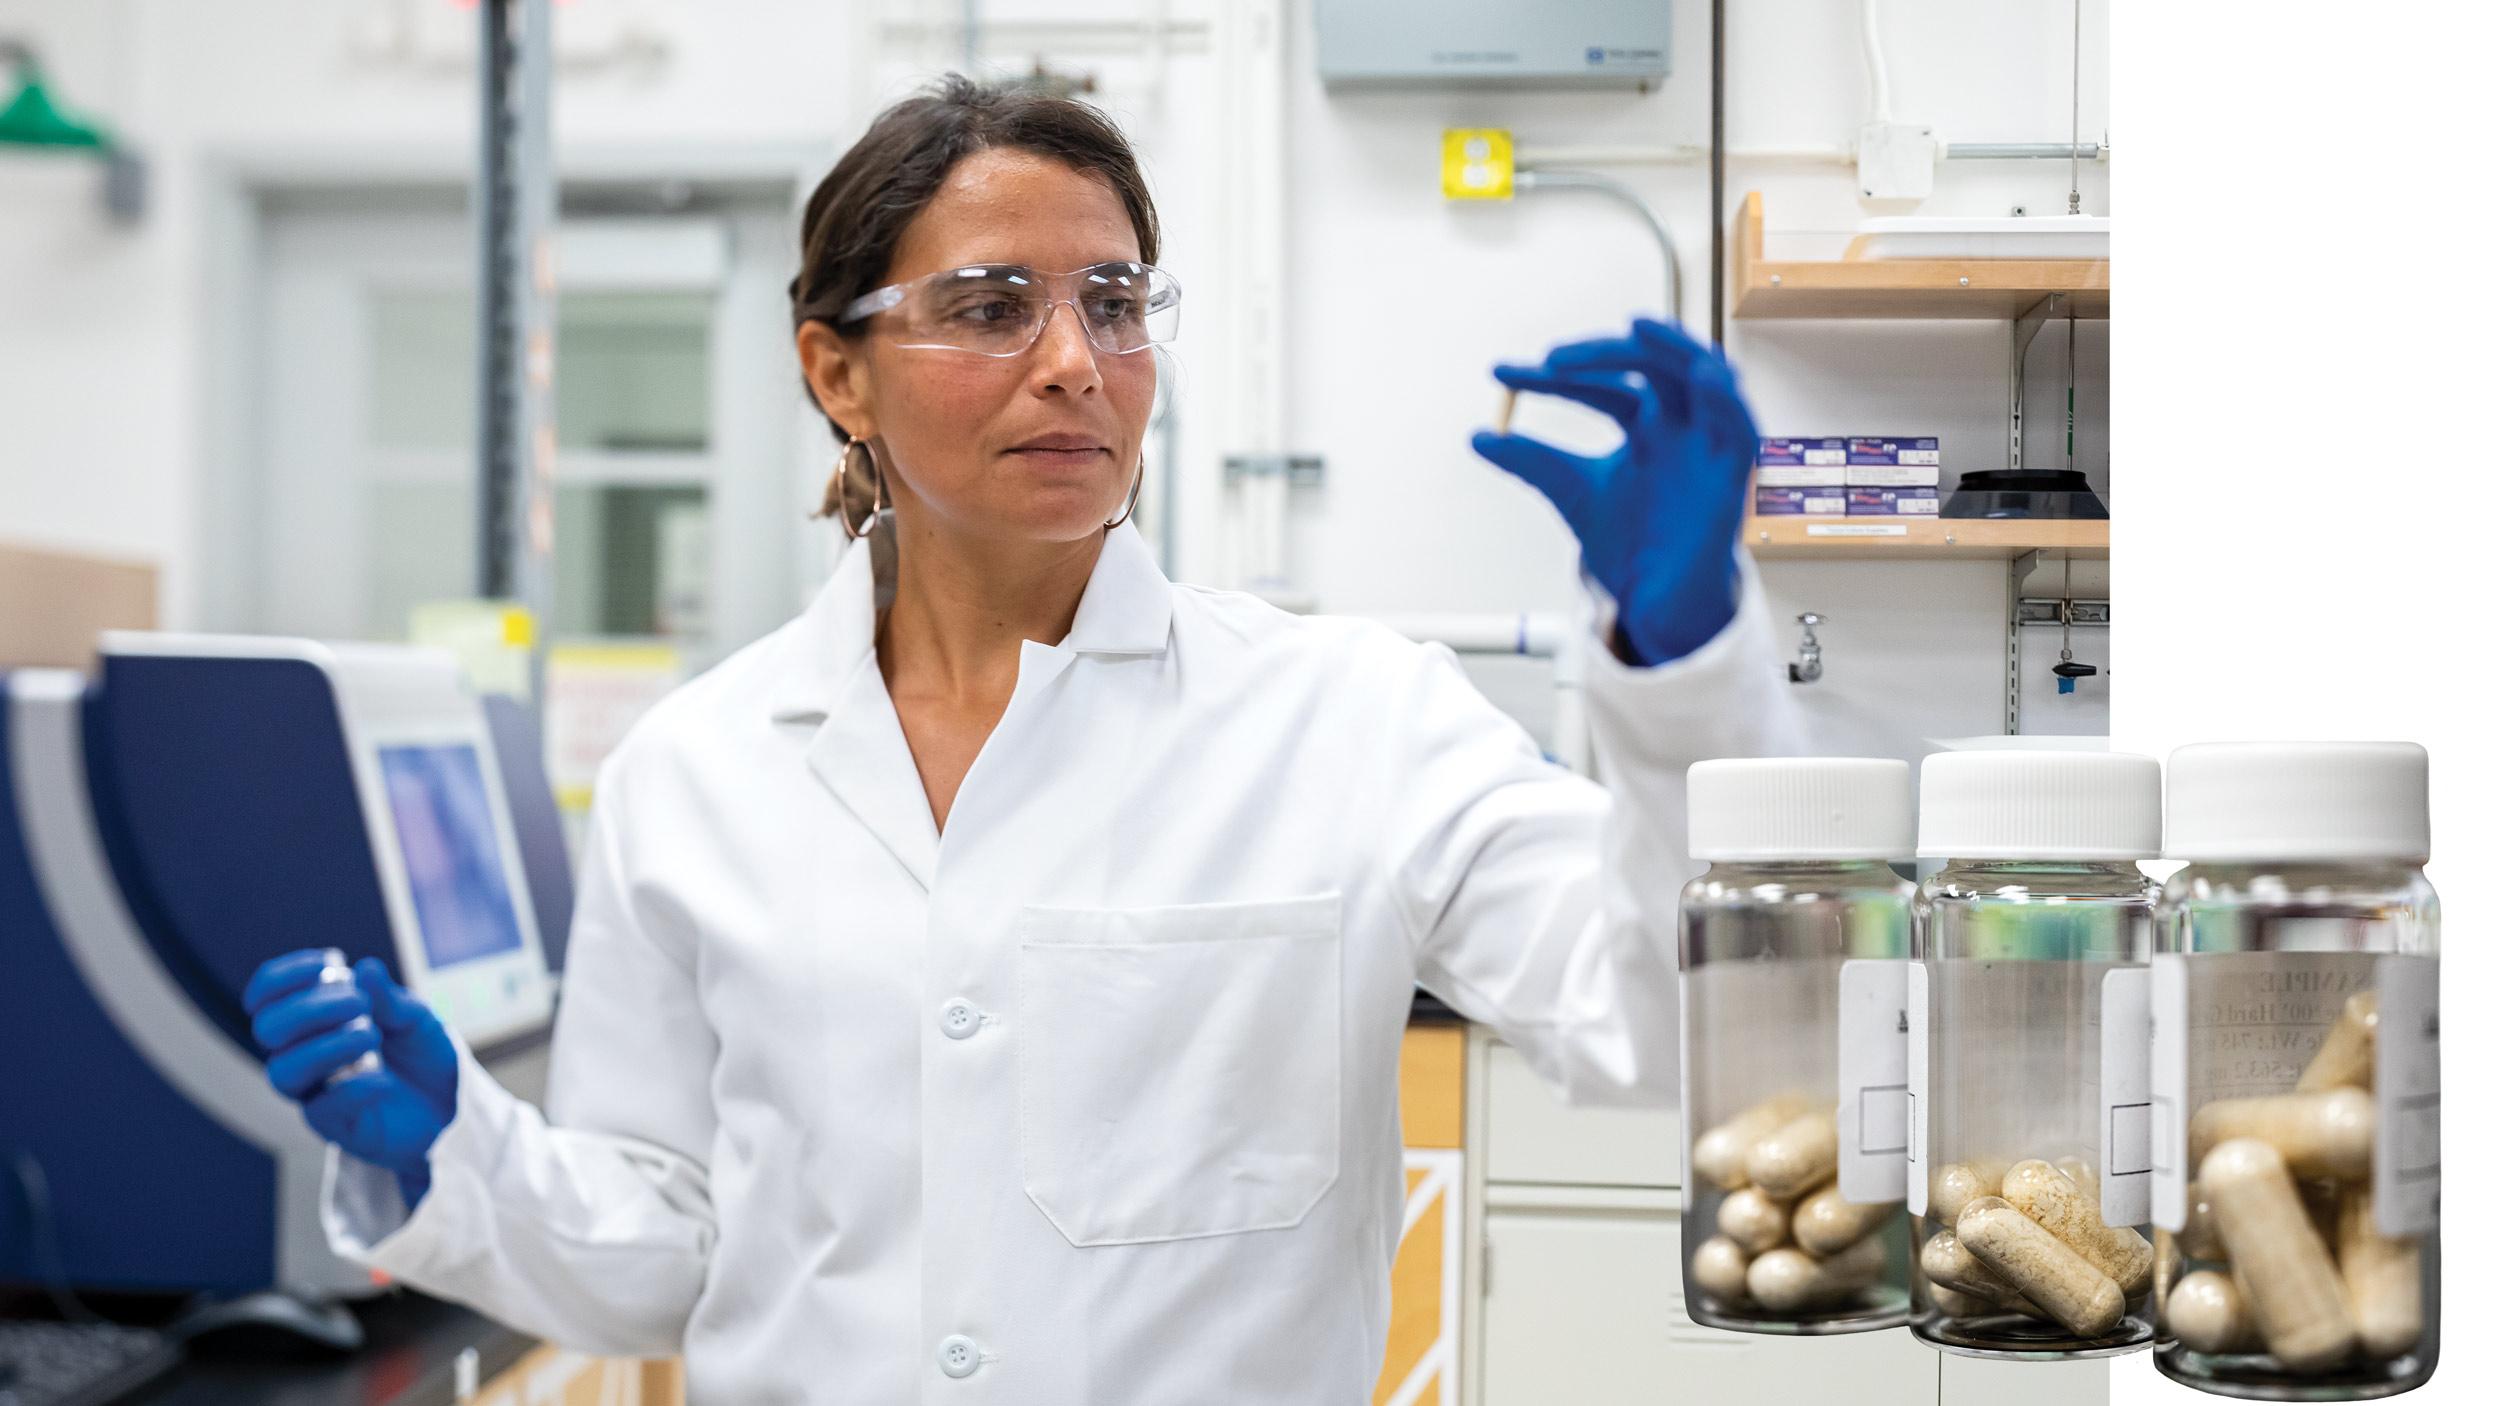 Rebecca Abergel in her lab holding a pill